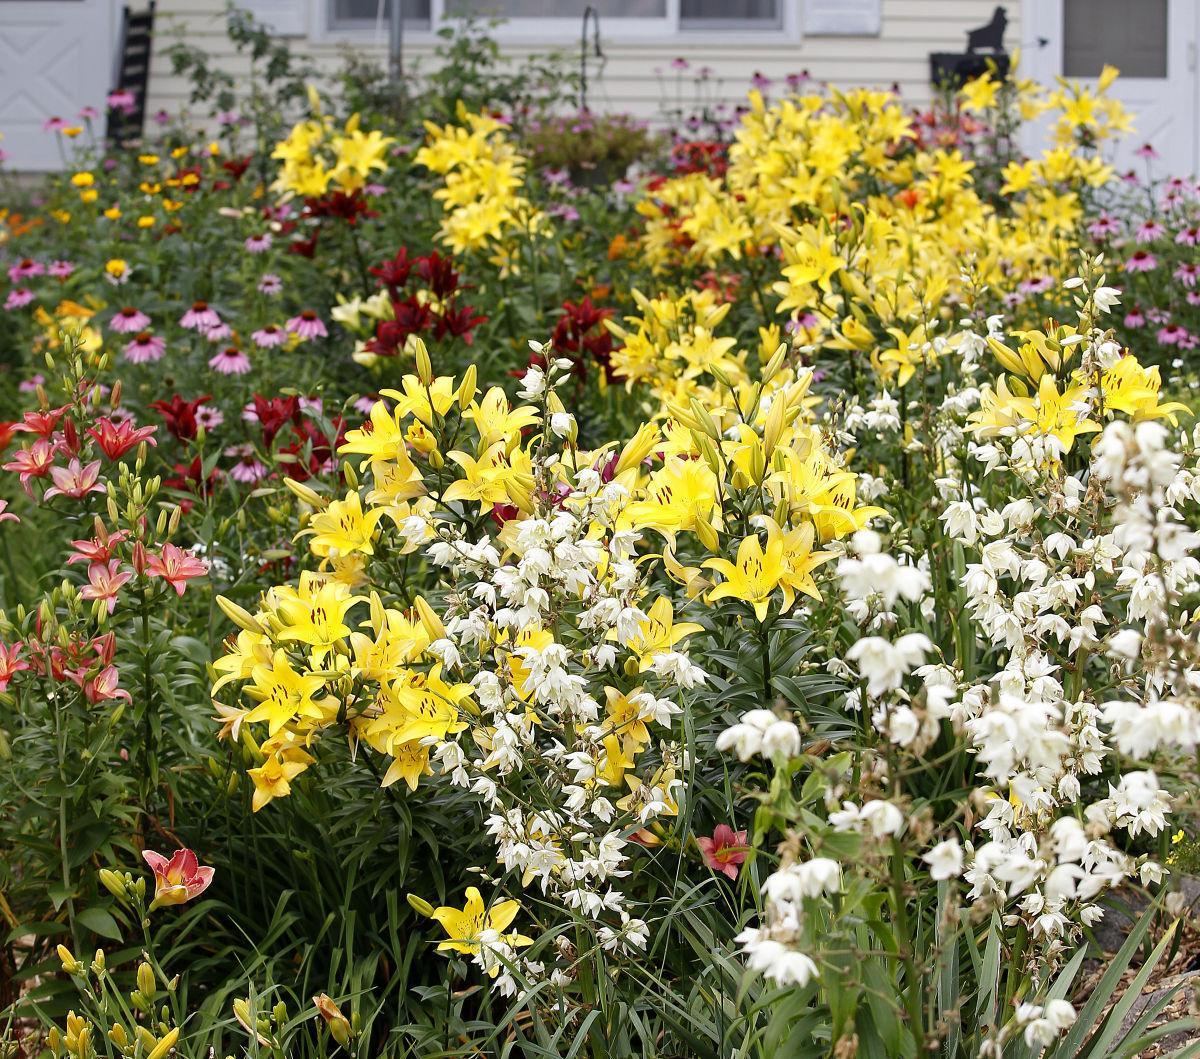 Front yard gardens | Gardening | wcfcourier.com